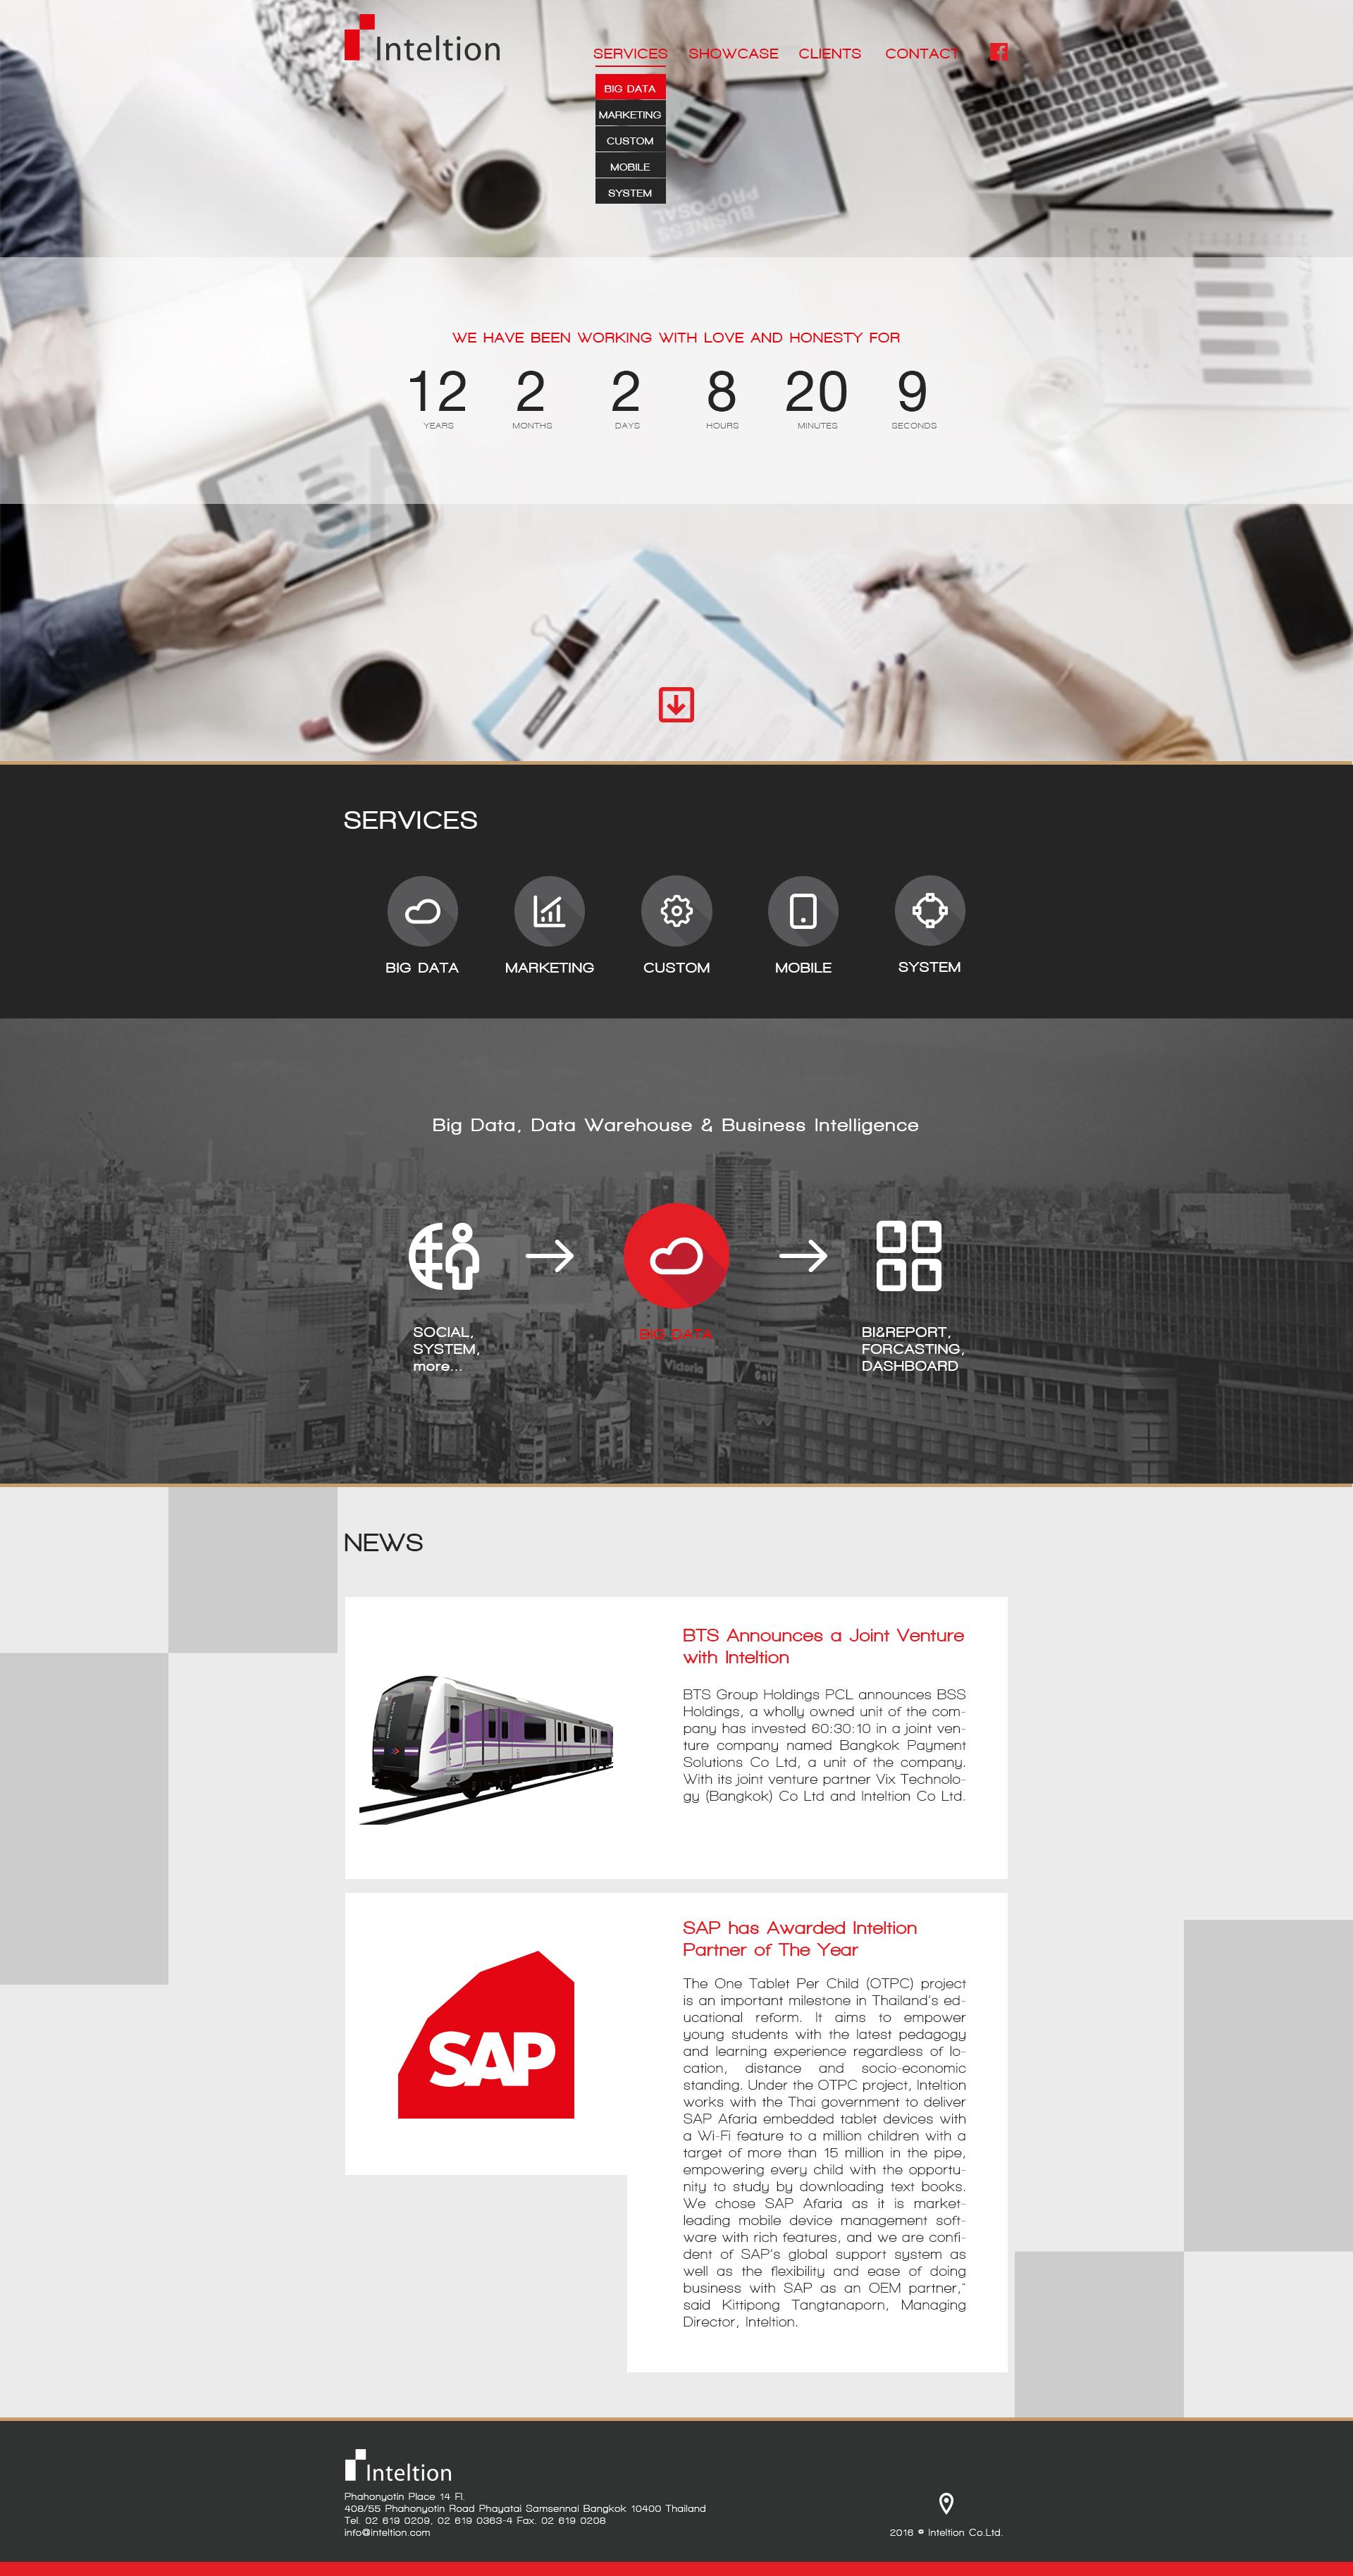 Inteltion Web Design Projects The Hidden Yard